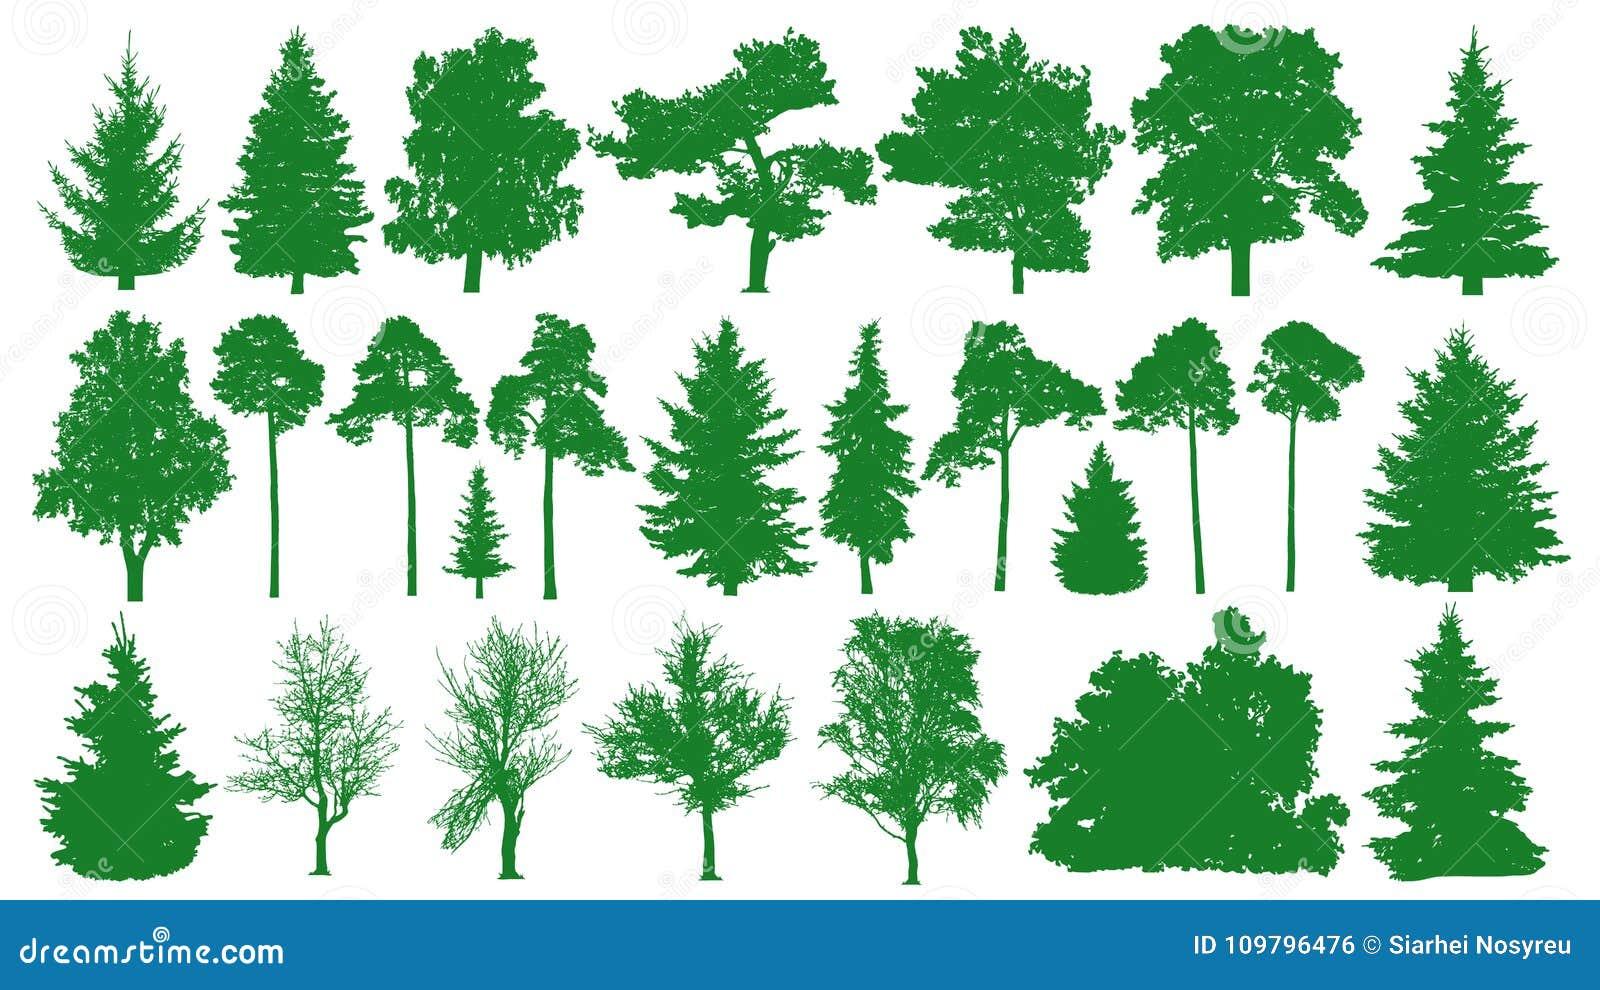 Green trees set. White background. Silhouette of a coniferous forest. Fir-tree, fir, pine, birch, oak, bush, branch.